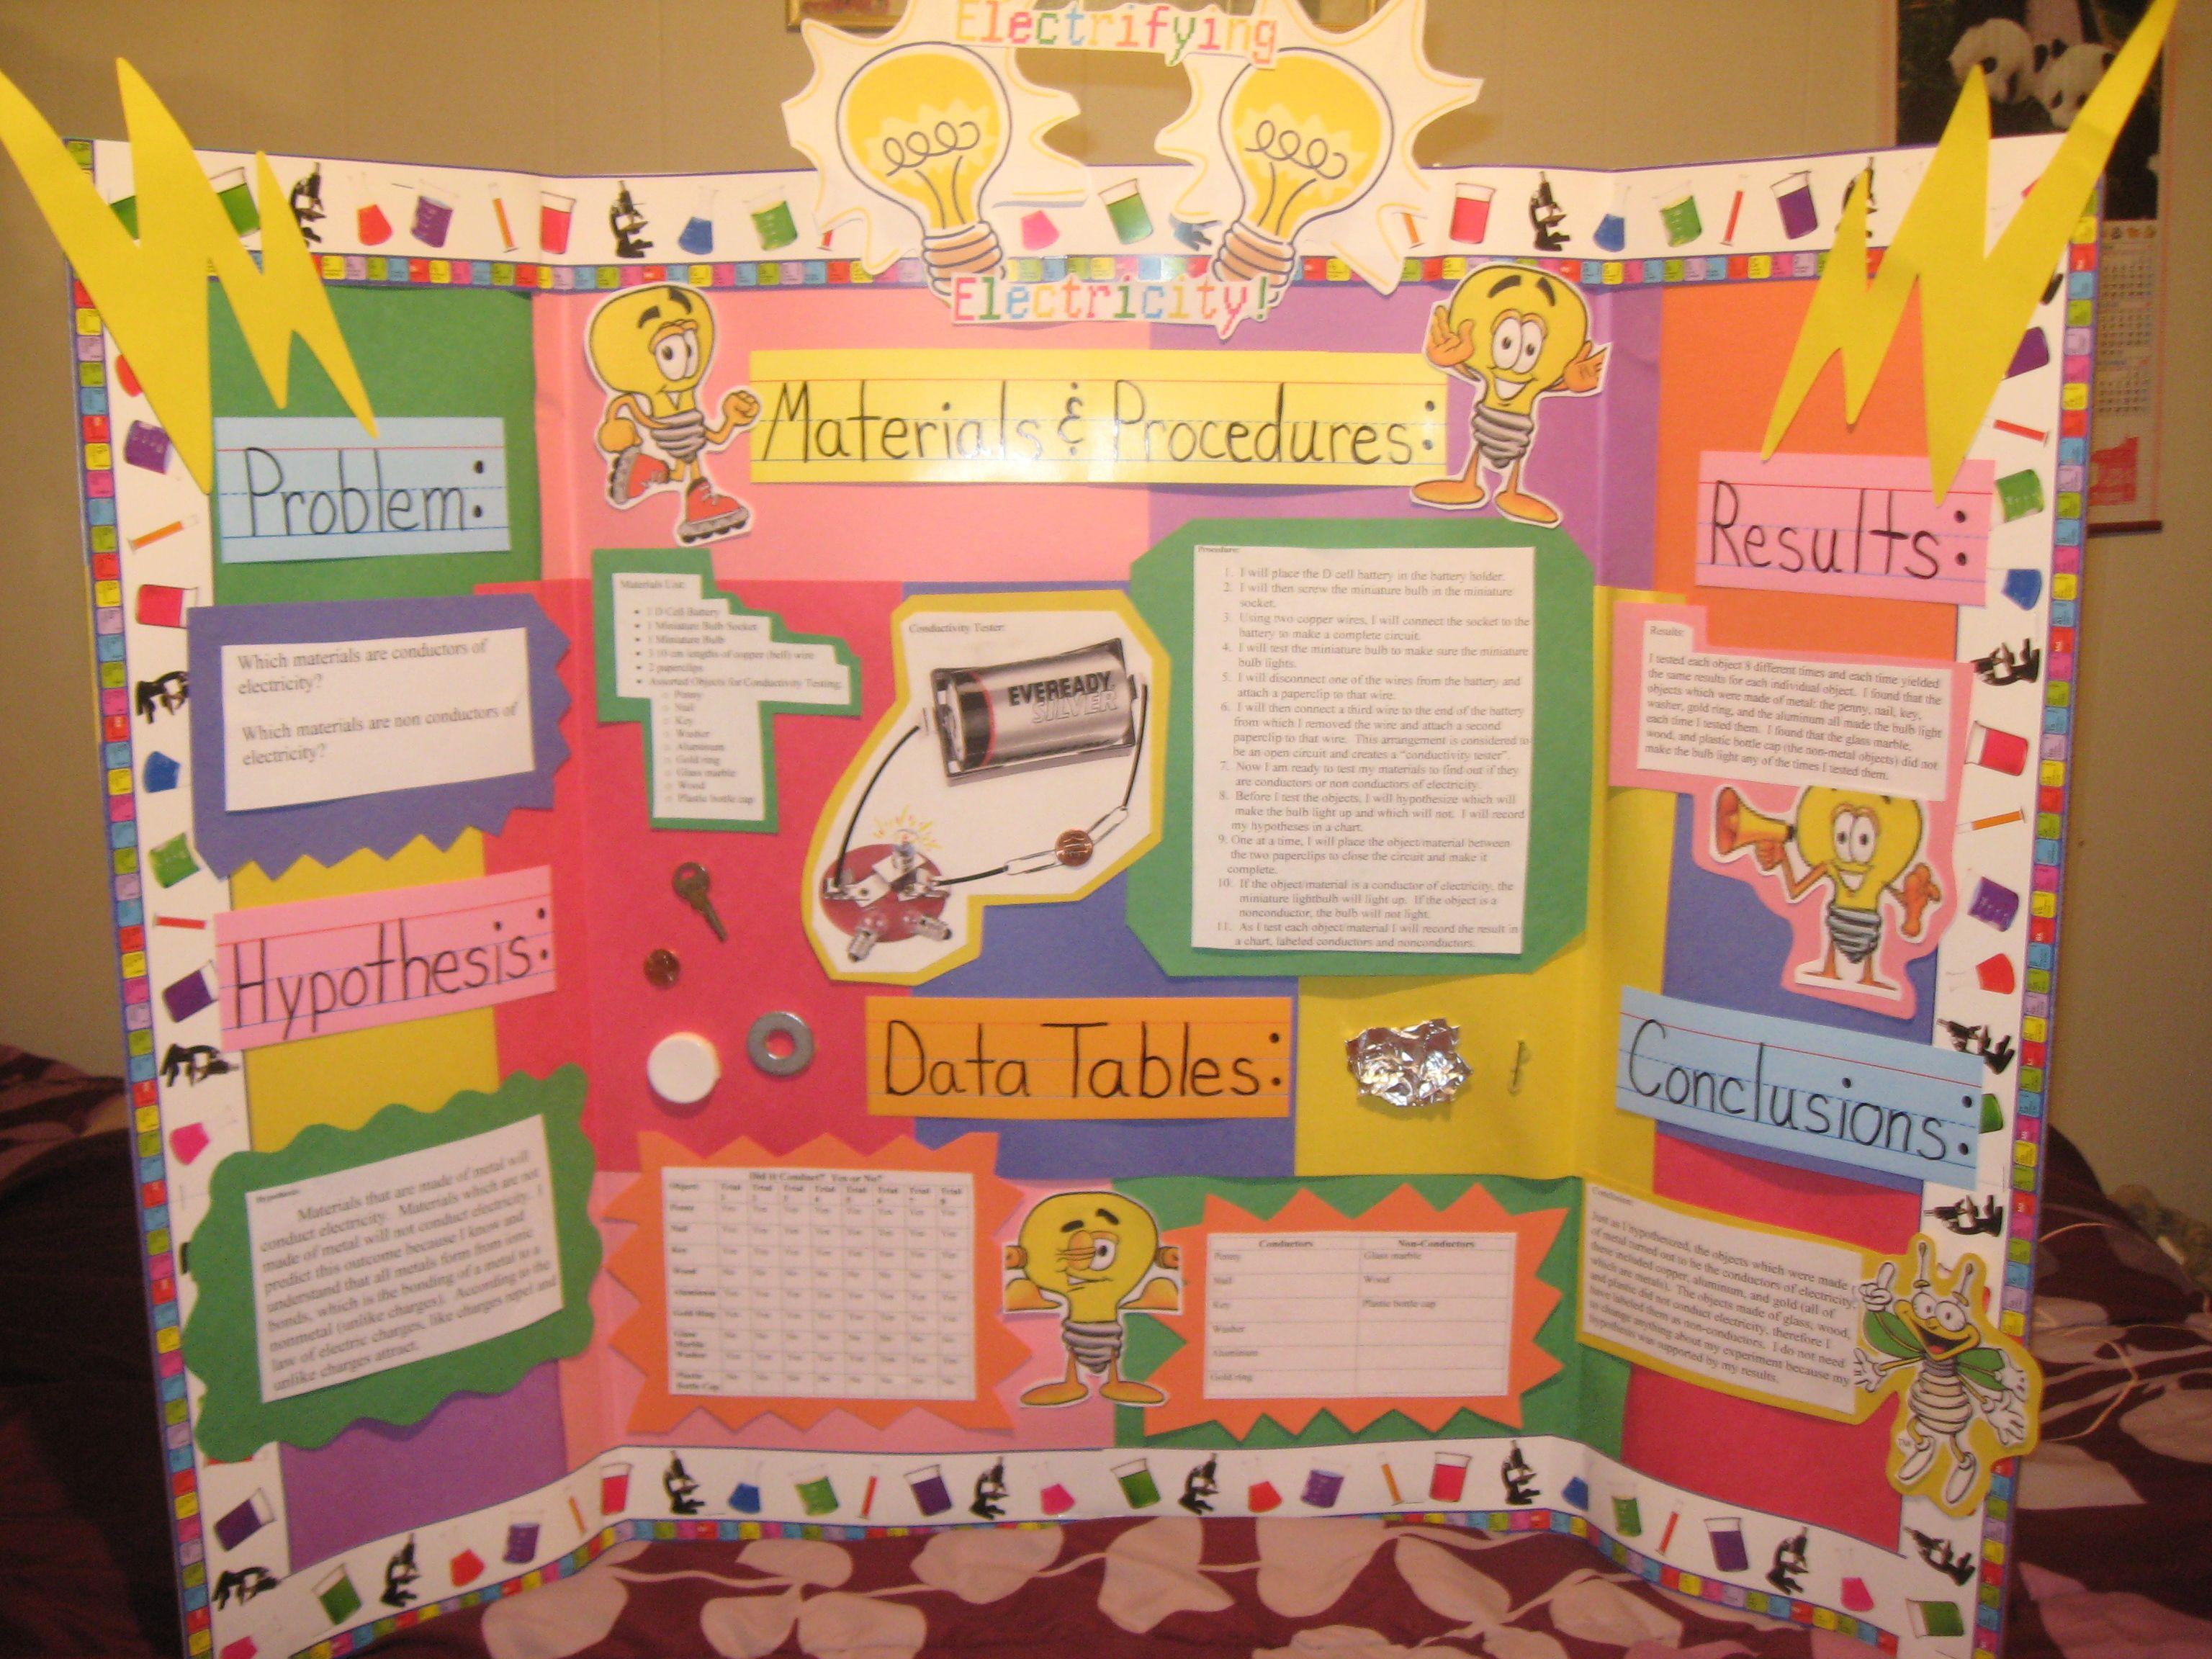 Science Fair Project- Electrify Electricity Fun Stuff